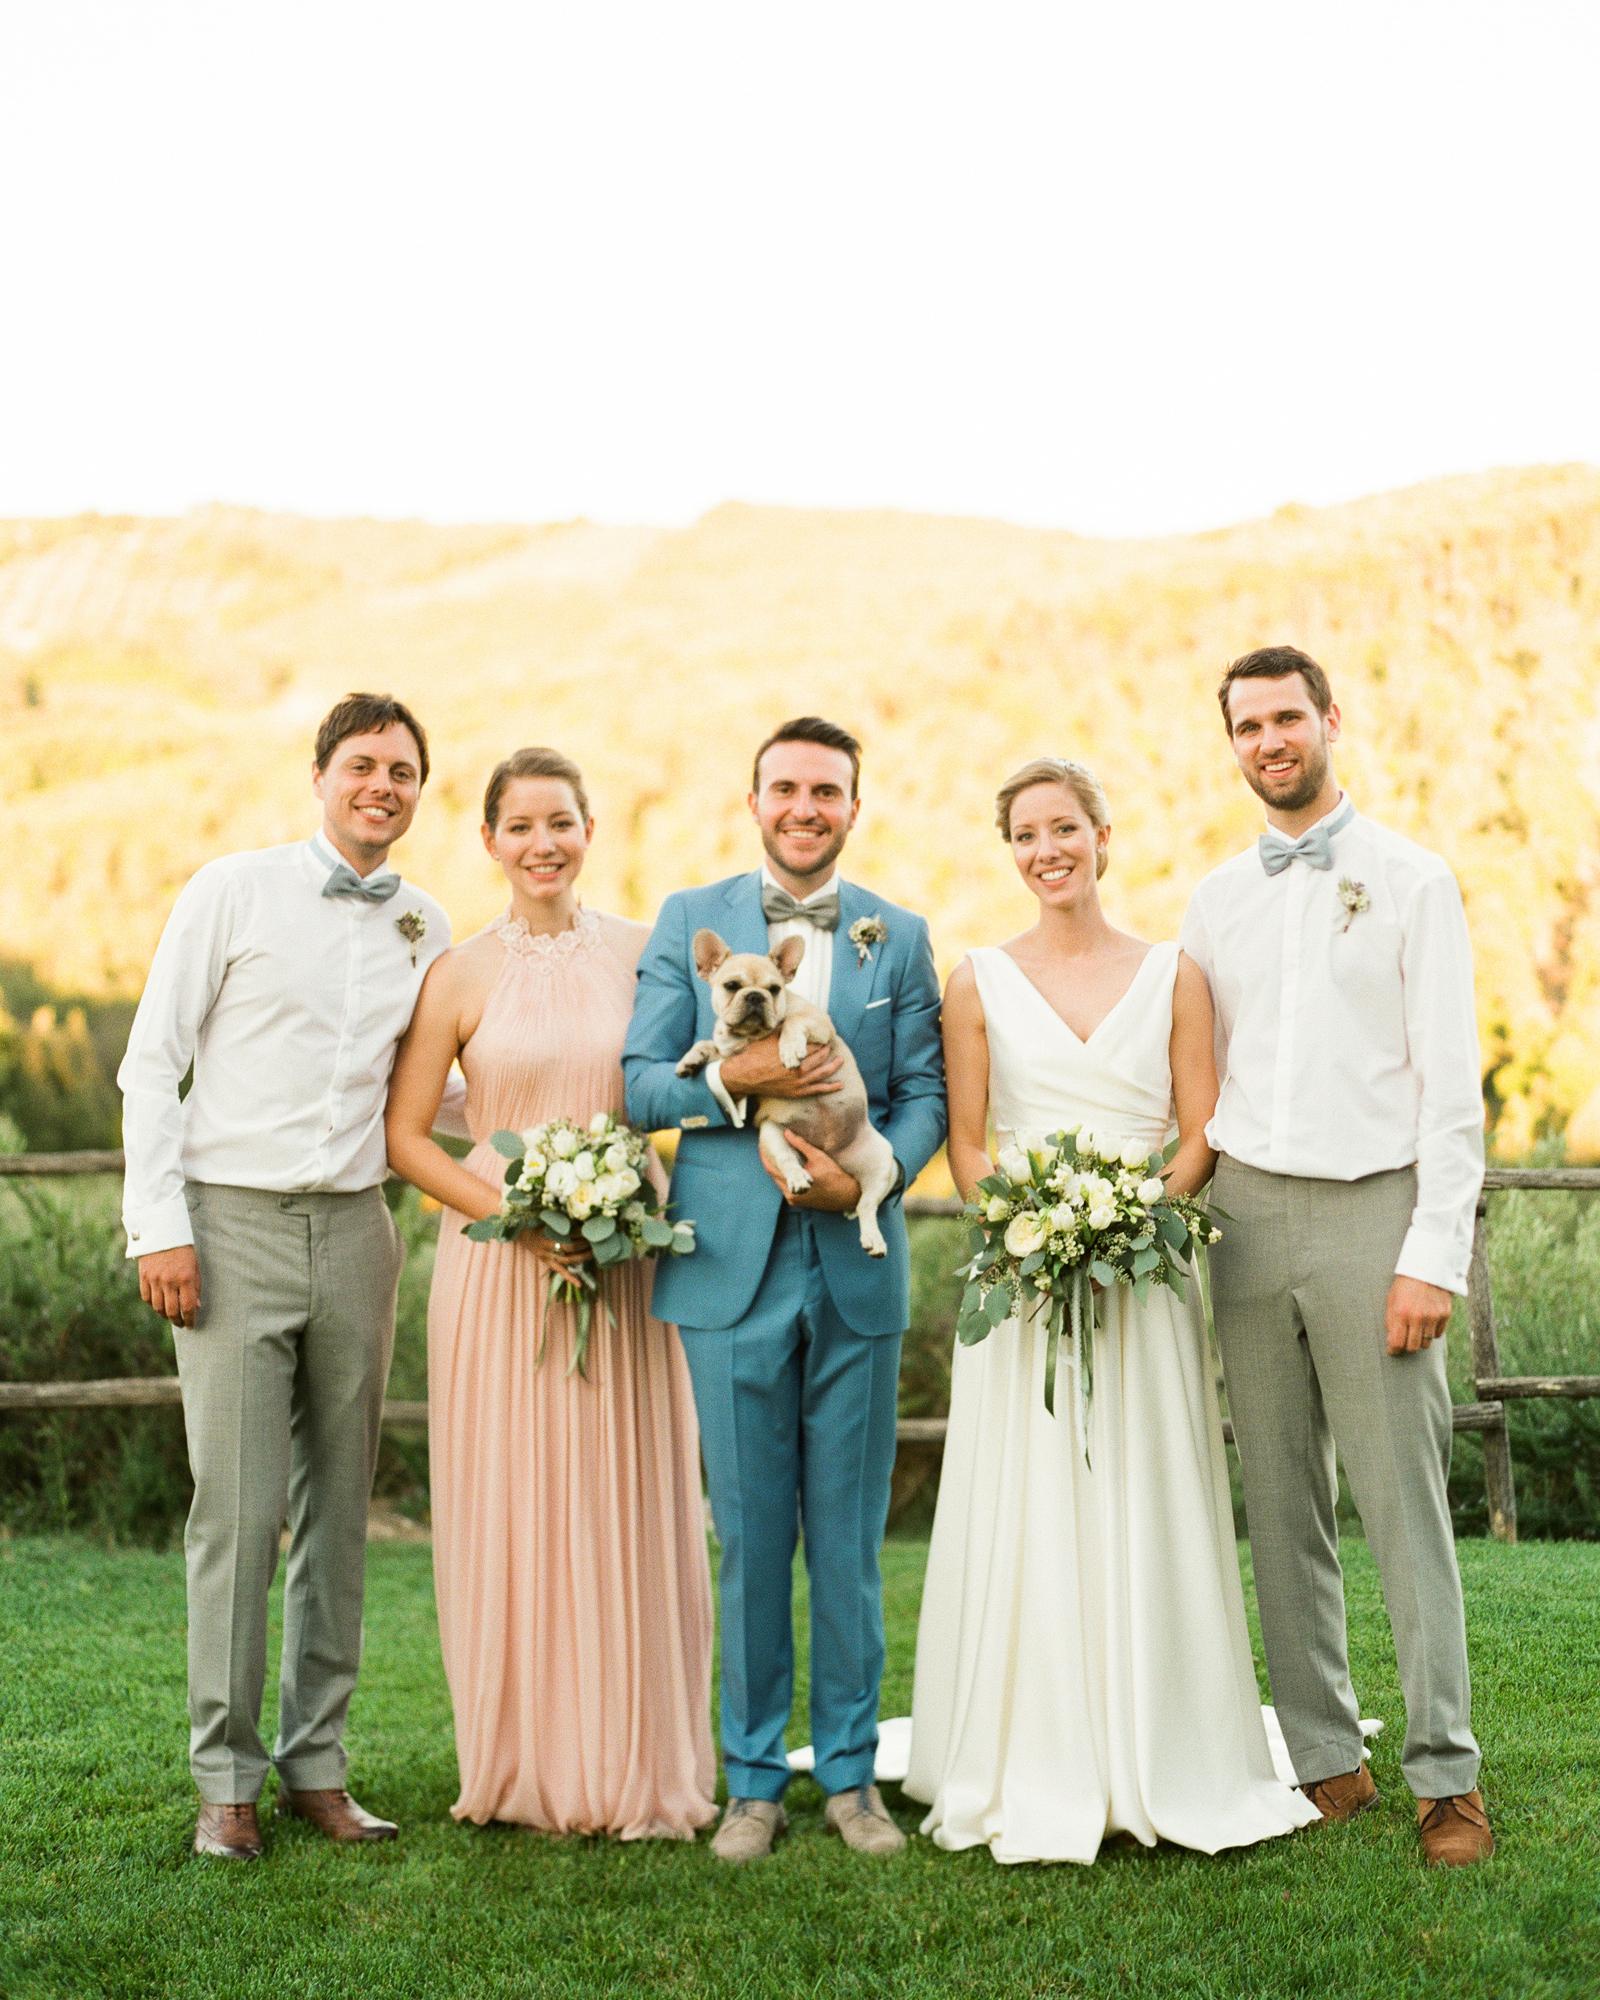 regina-jack-wedding-bridalparty-52-s111820-0215.jpg